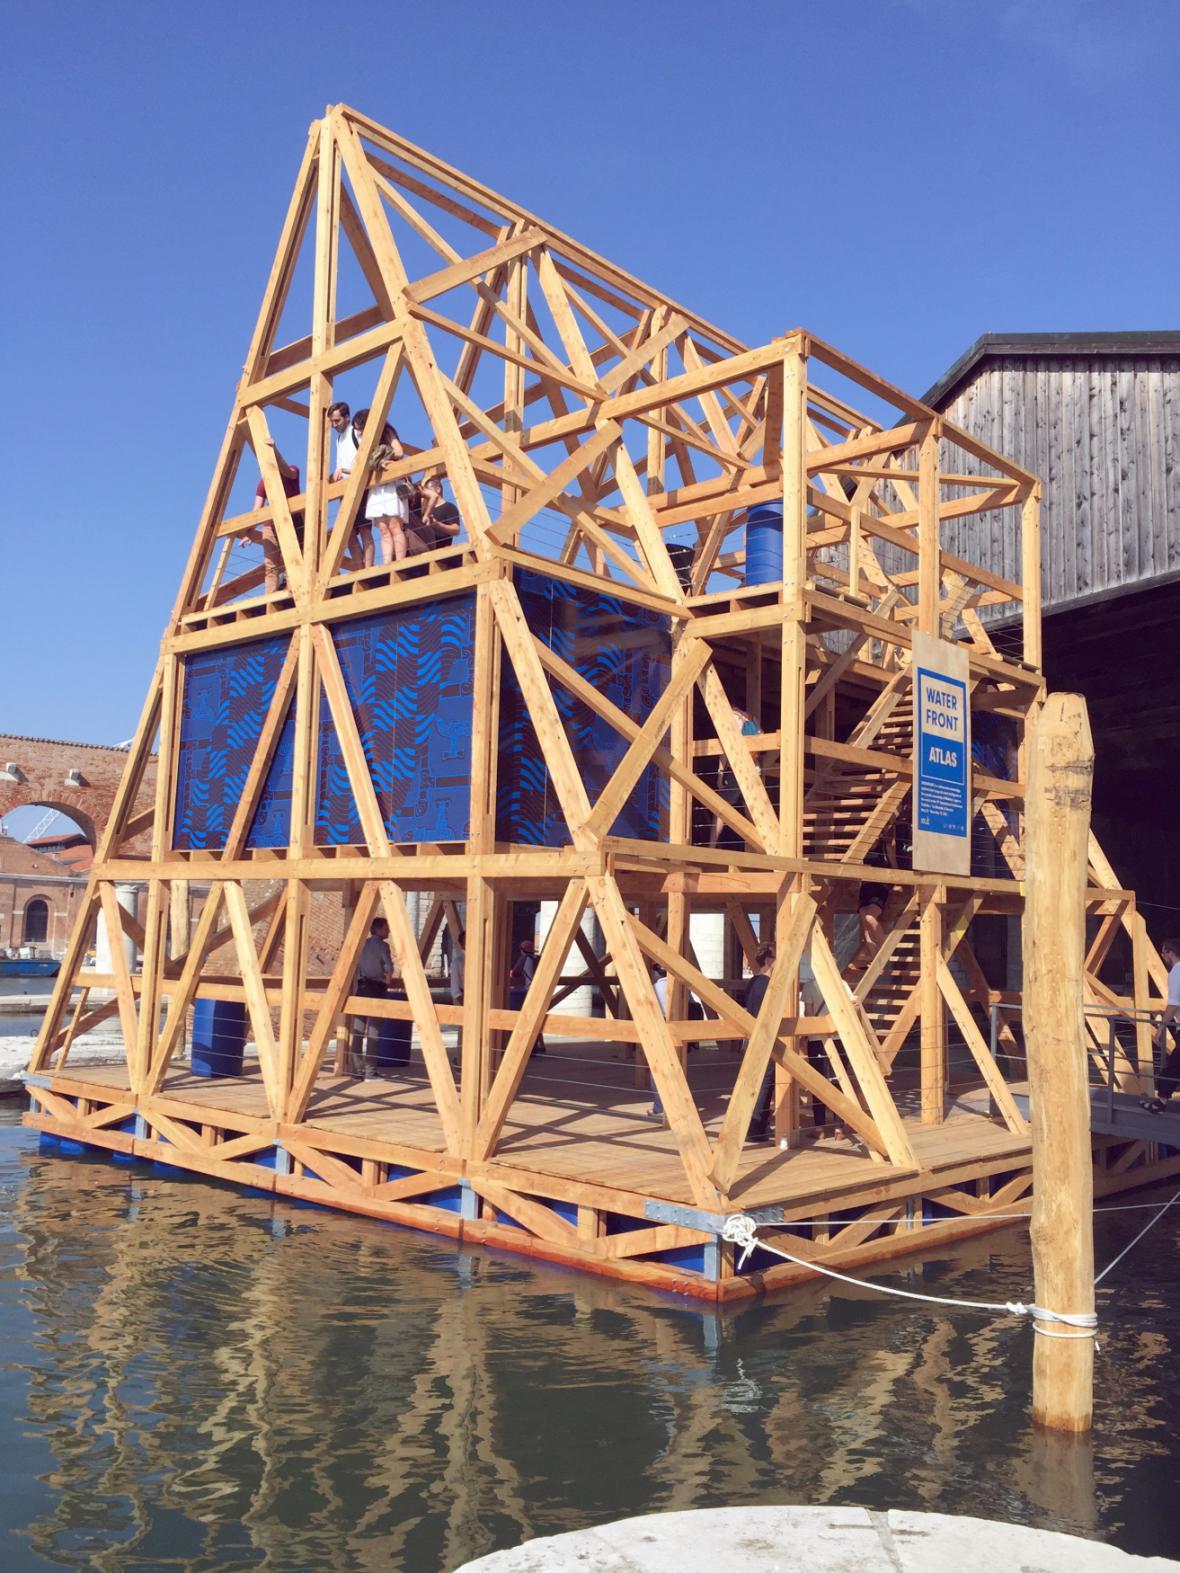 15. bienále architektury v Benátkách